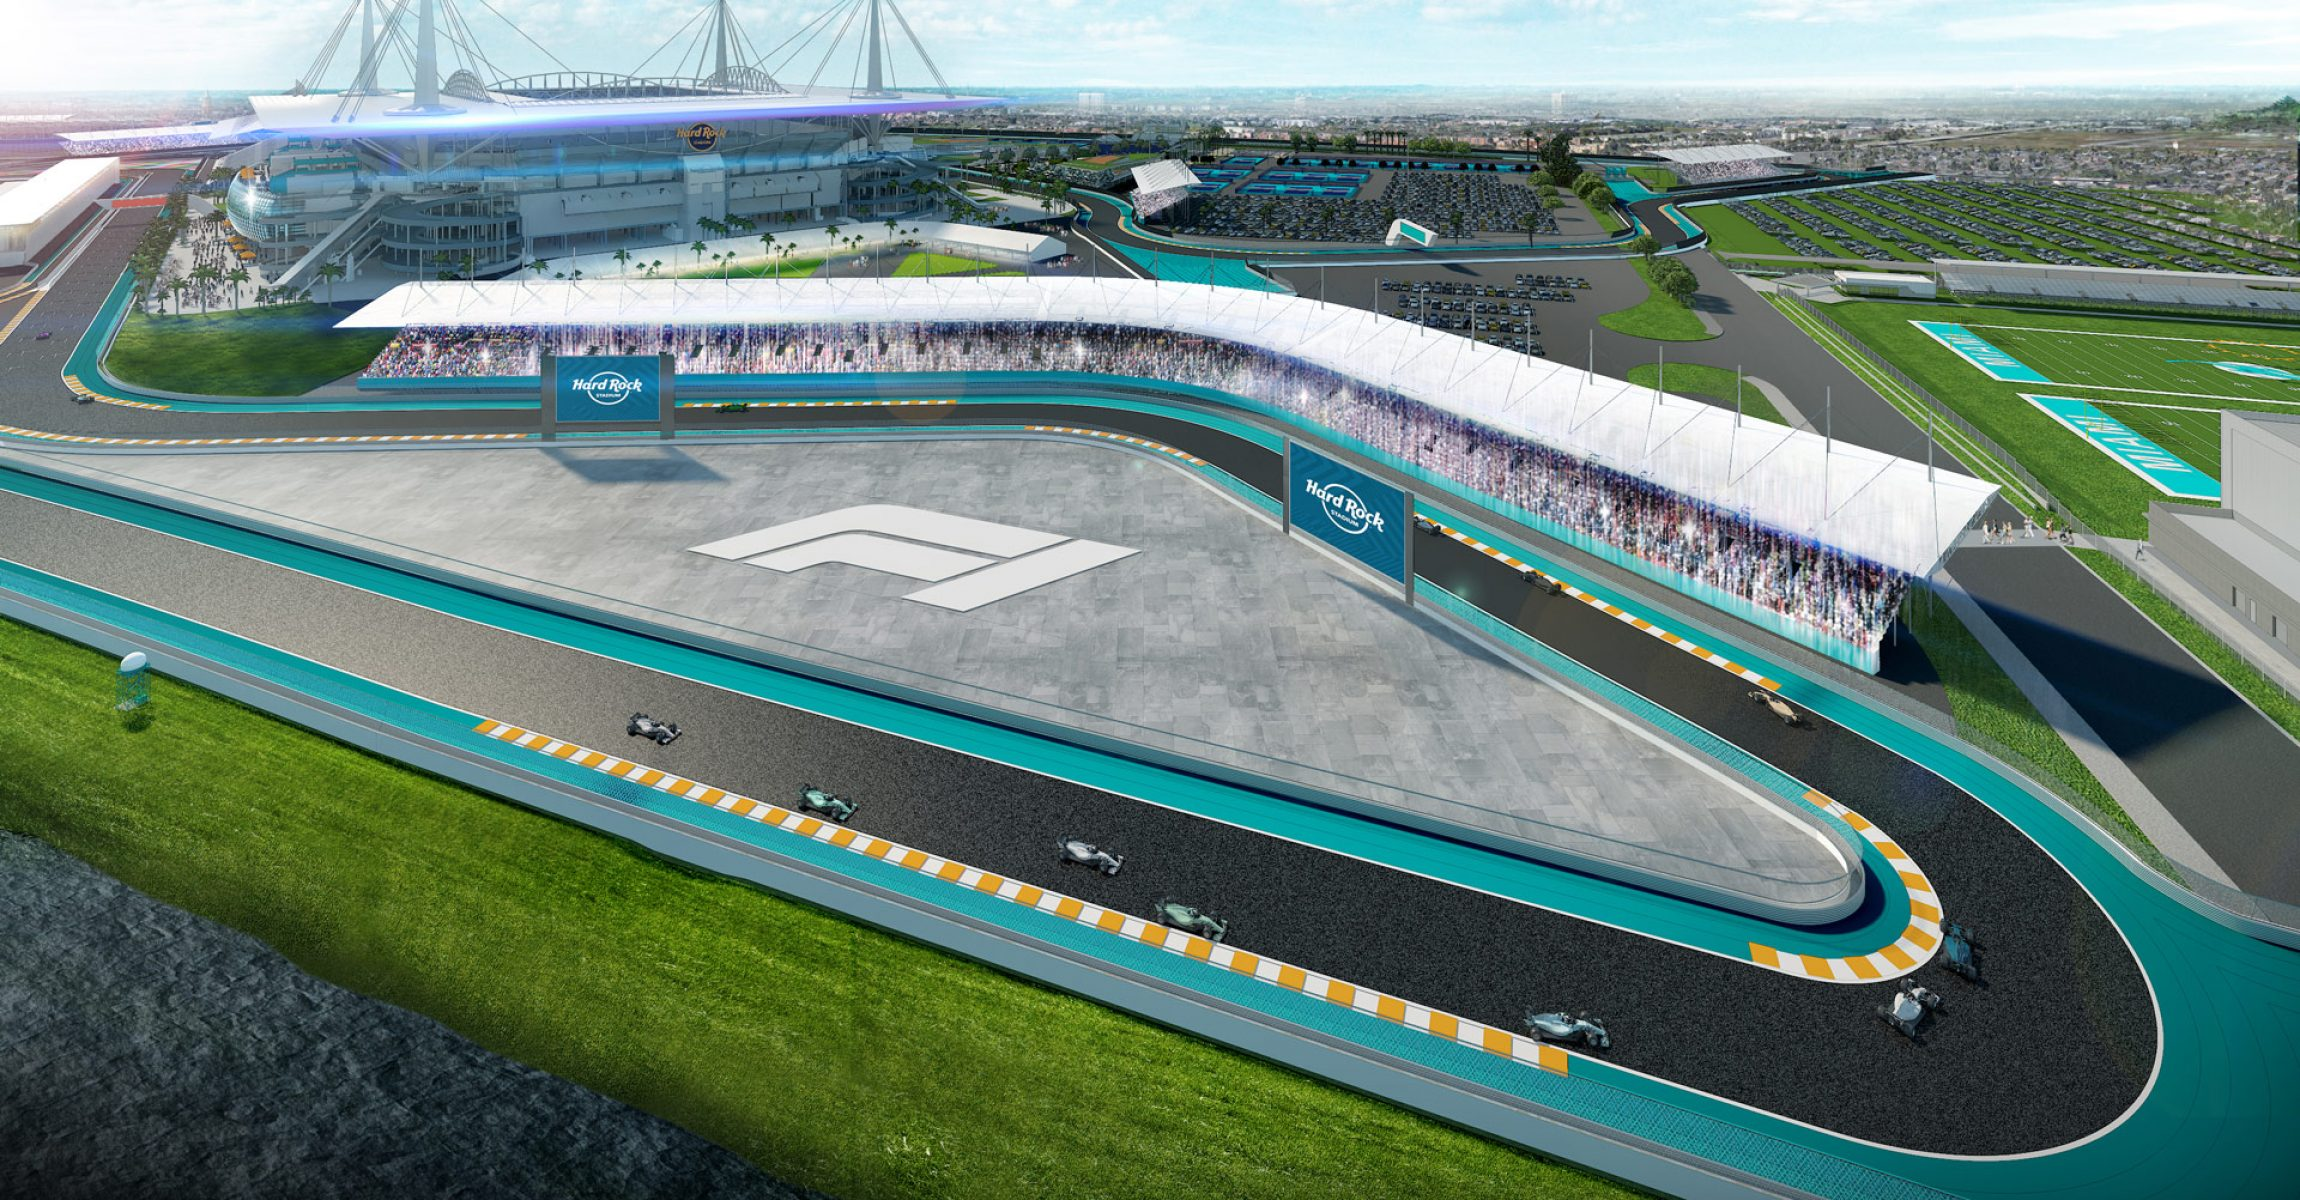 Miami Grand Prix Hard Rock Stadium